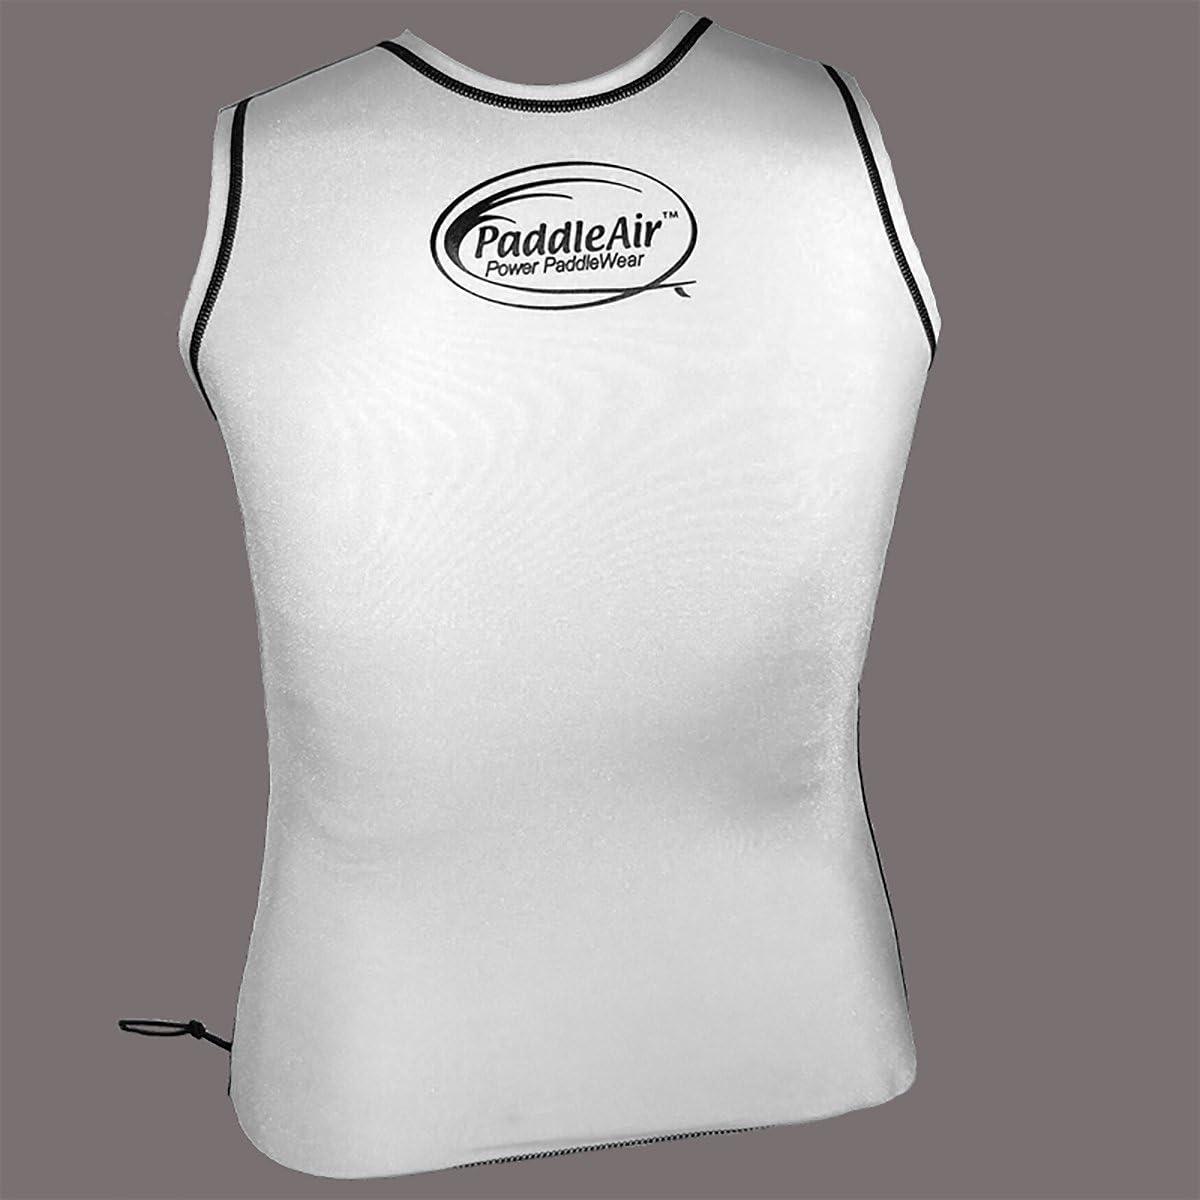 PaddleAir The Rib Rocket Short Sleeve Lycra//Neoprene Black//Slate Gray